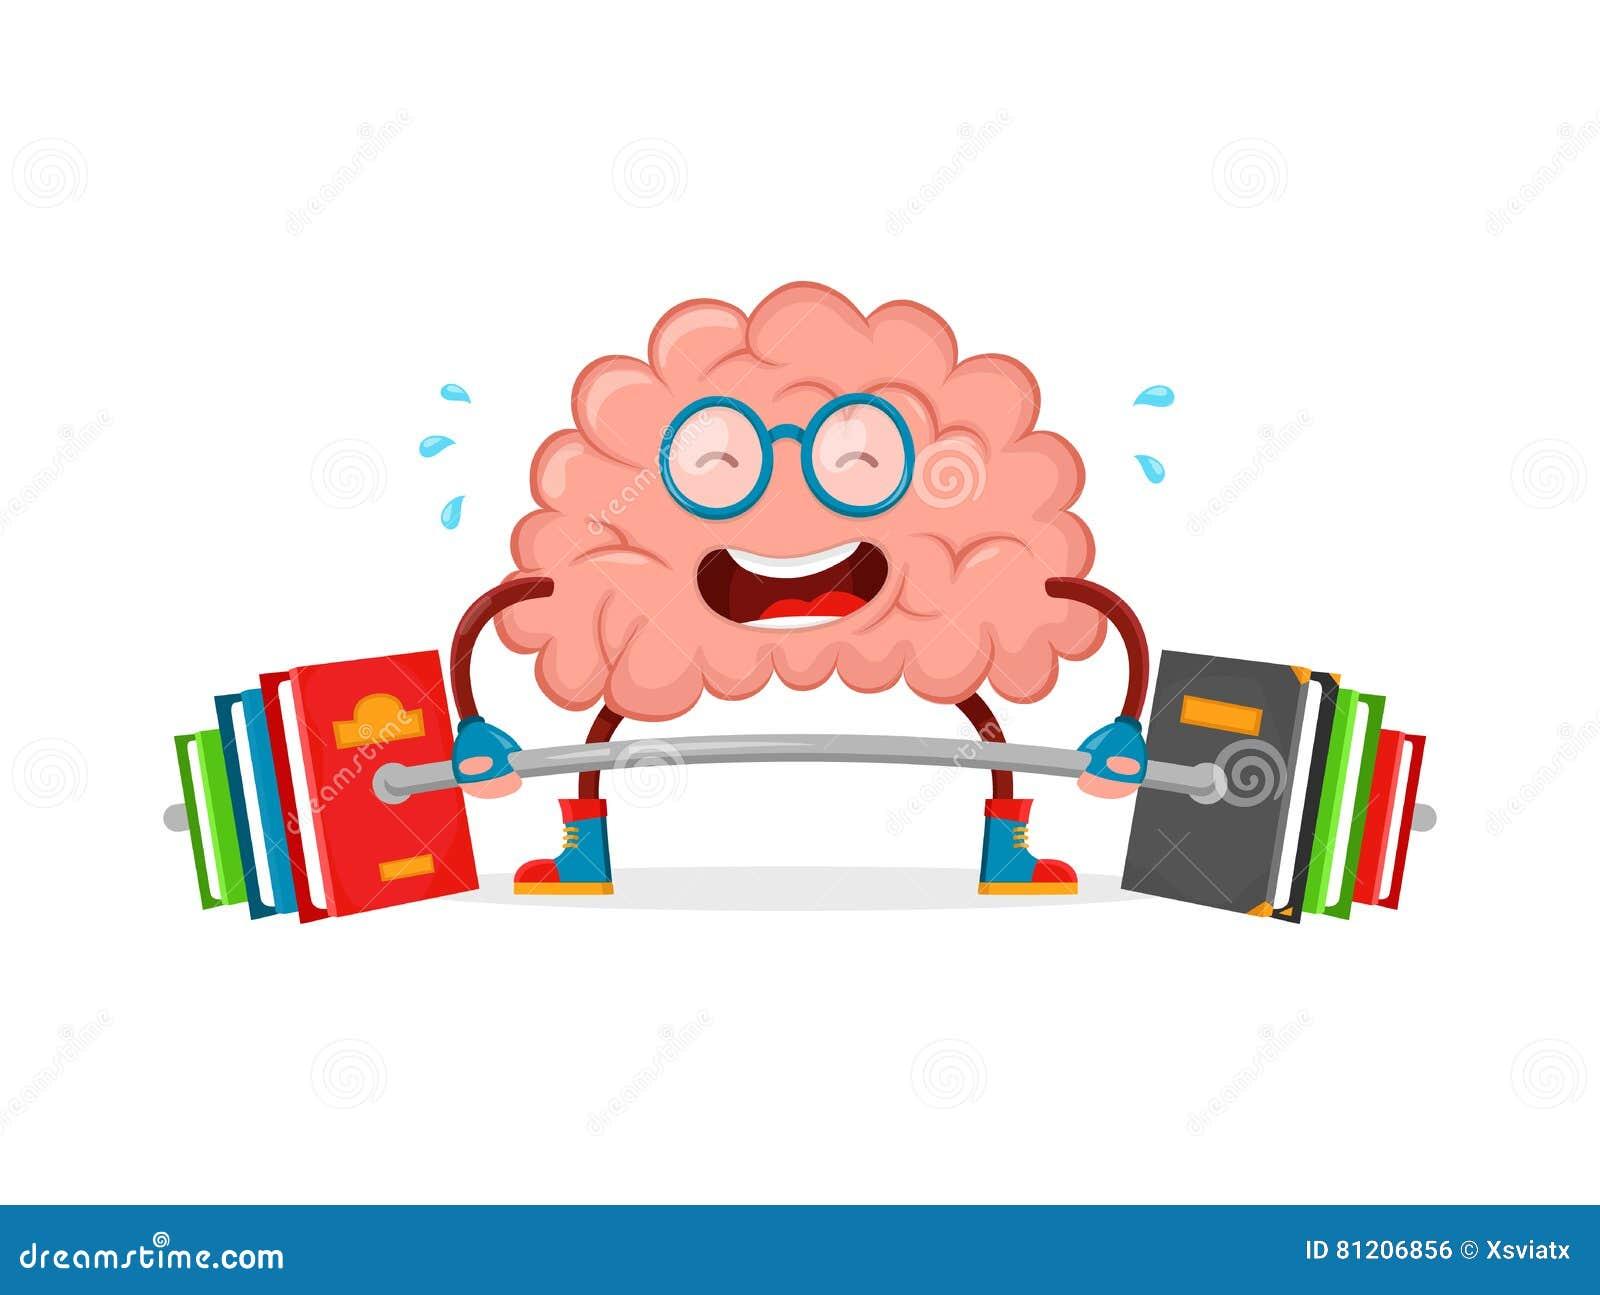 Train Your Brain. Brain Vector Cartoon Flat Illustration Fun ... for Smart Cartoon Brain  177nar